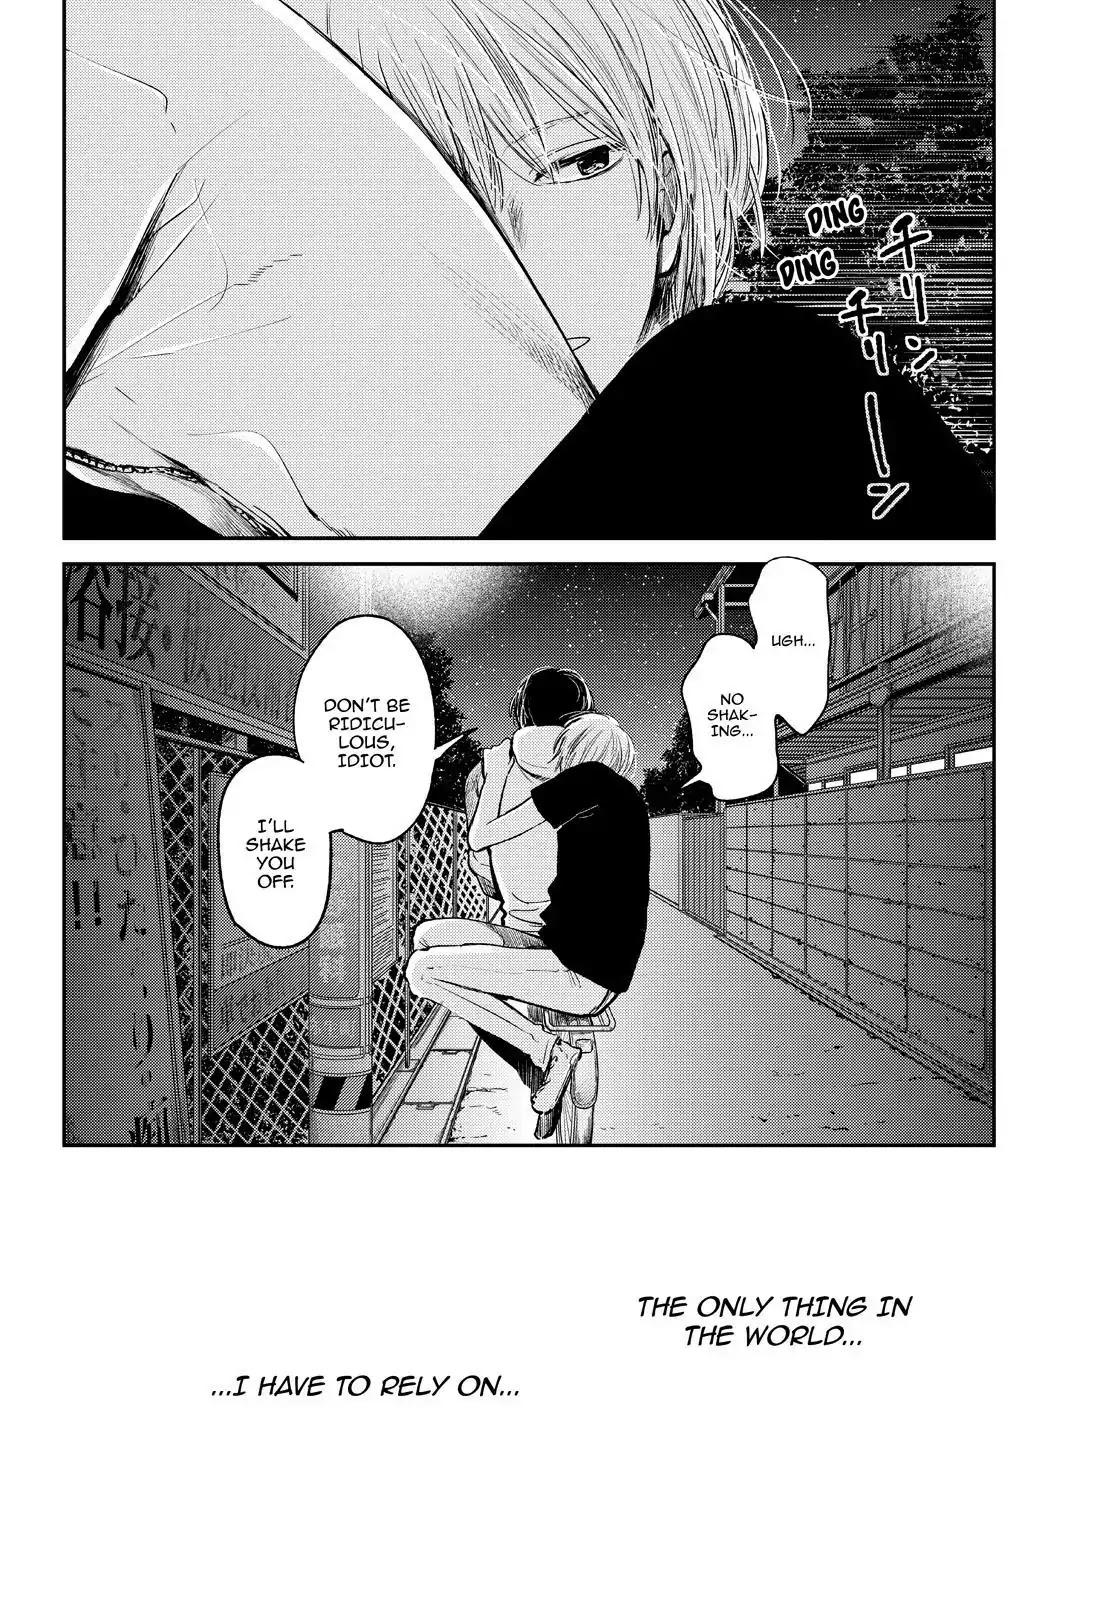 Kuzu No Honkai Decor Chapter 5 The End Read Manga Online Free